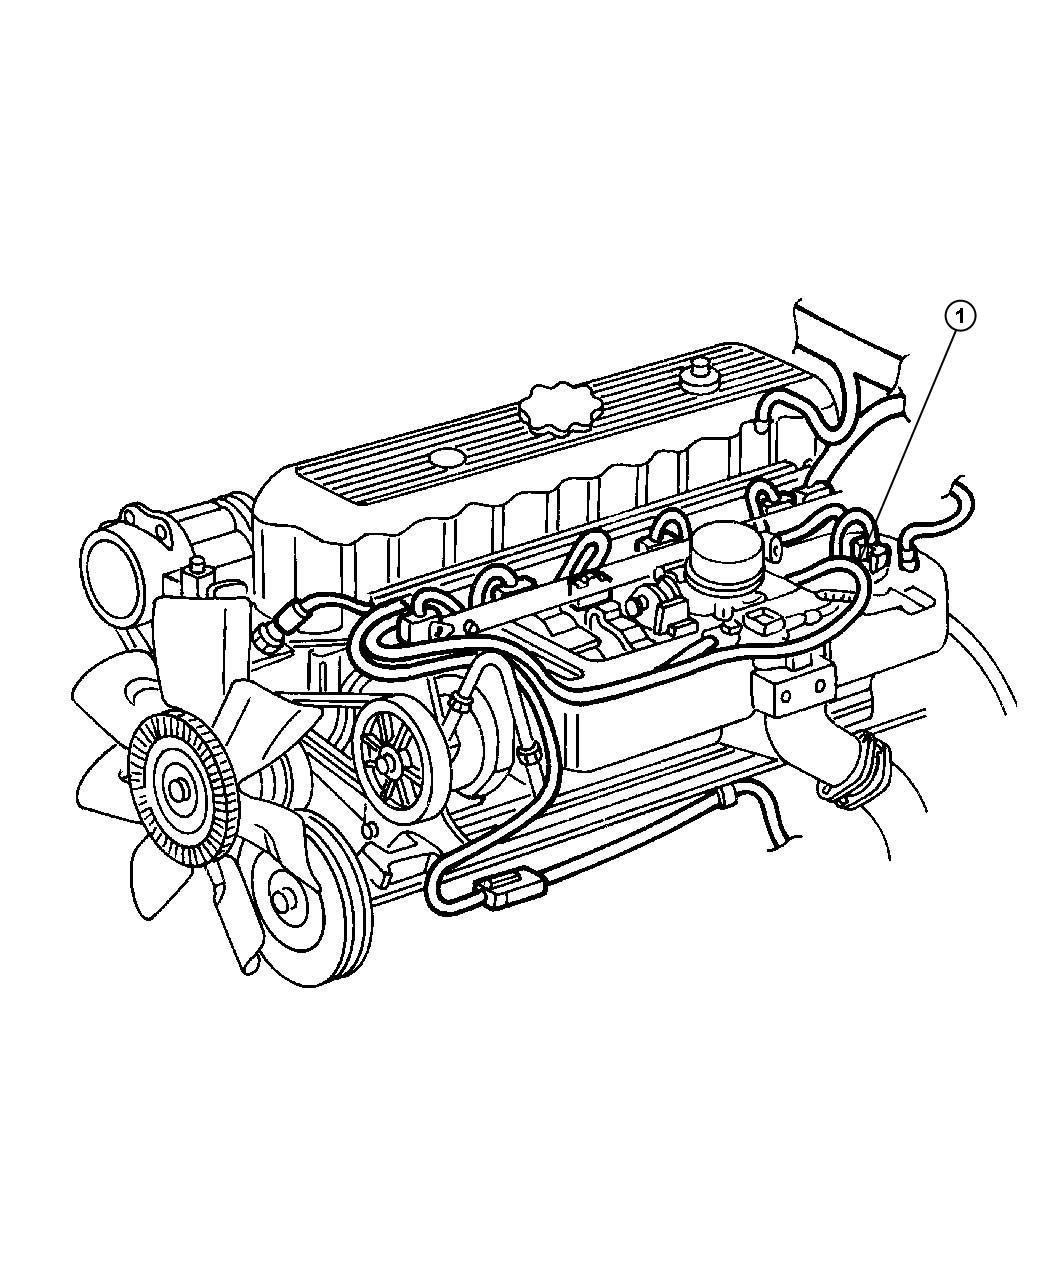 Jeep Liberty Strap. Engine. Ground. Enginebodyhood